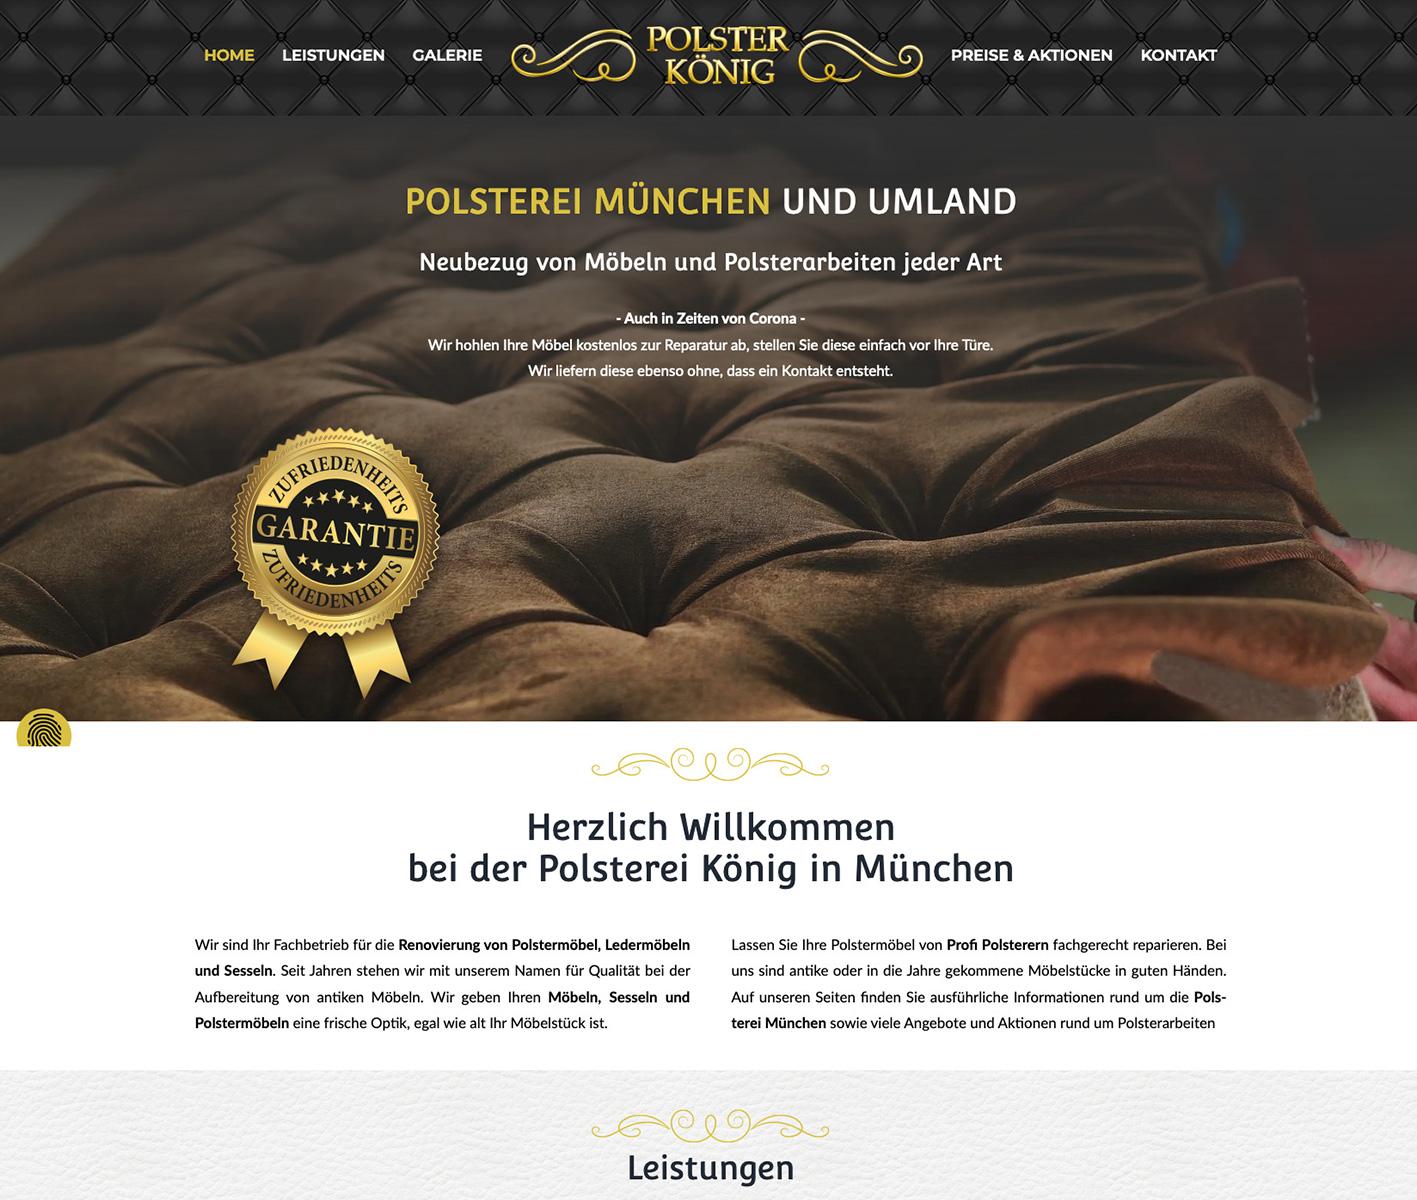 webdesign-polsterkoenig-muenchen-preview